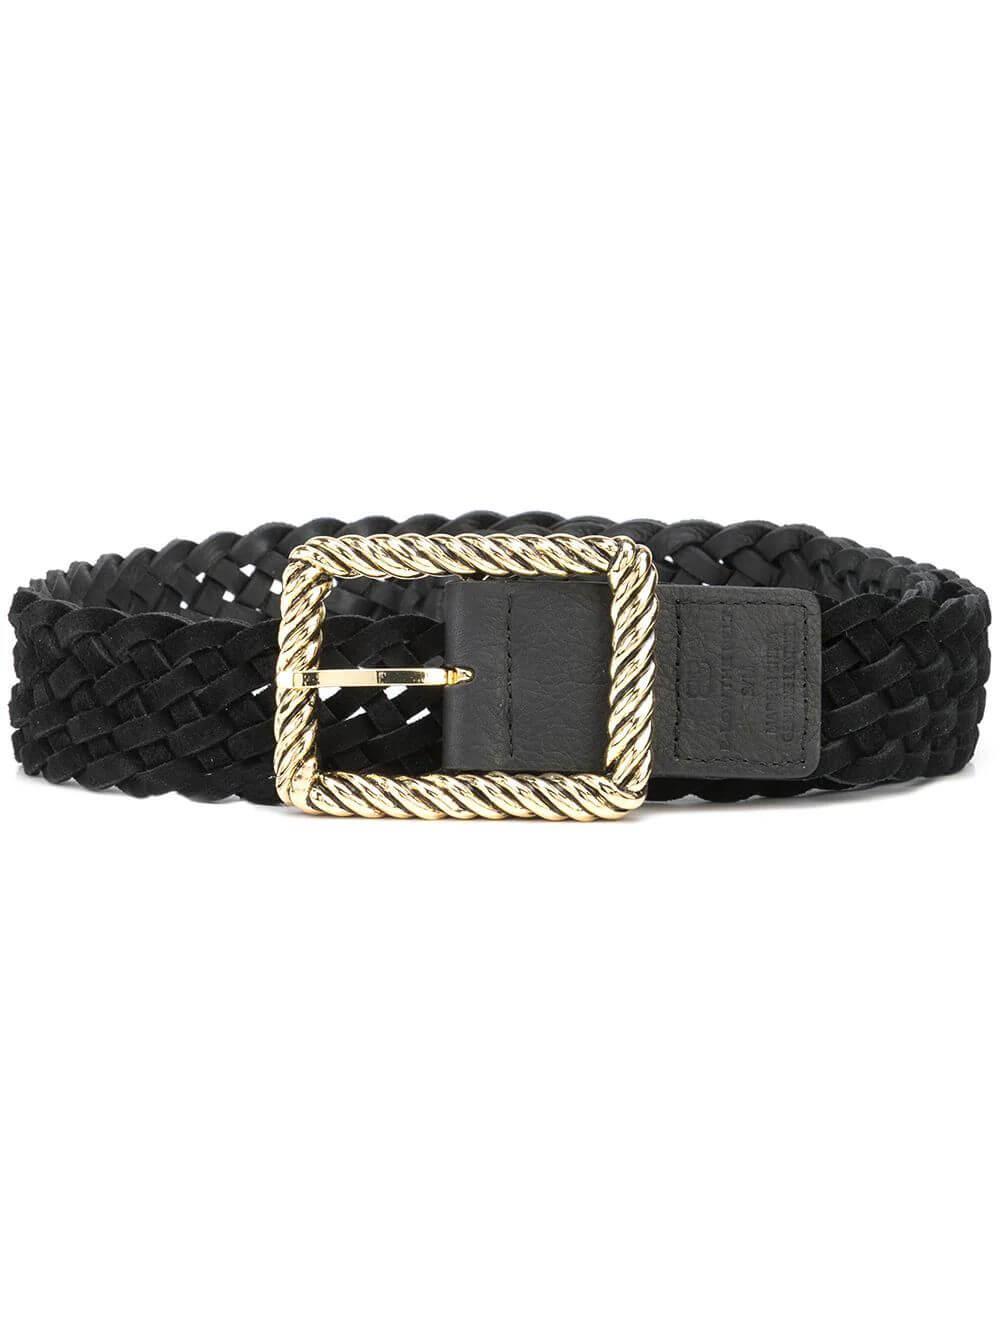 Janelle Braided Belt Item # BH776-465LE